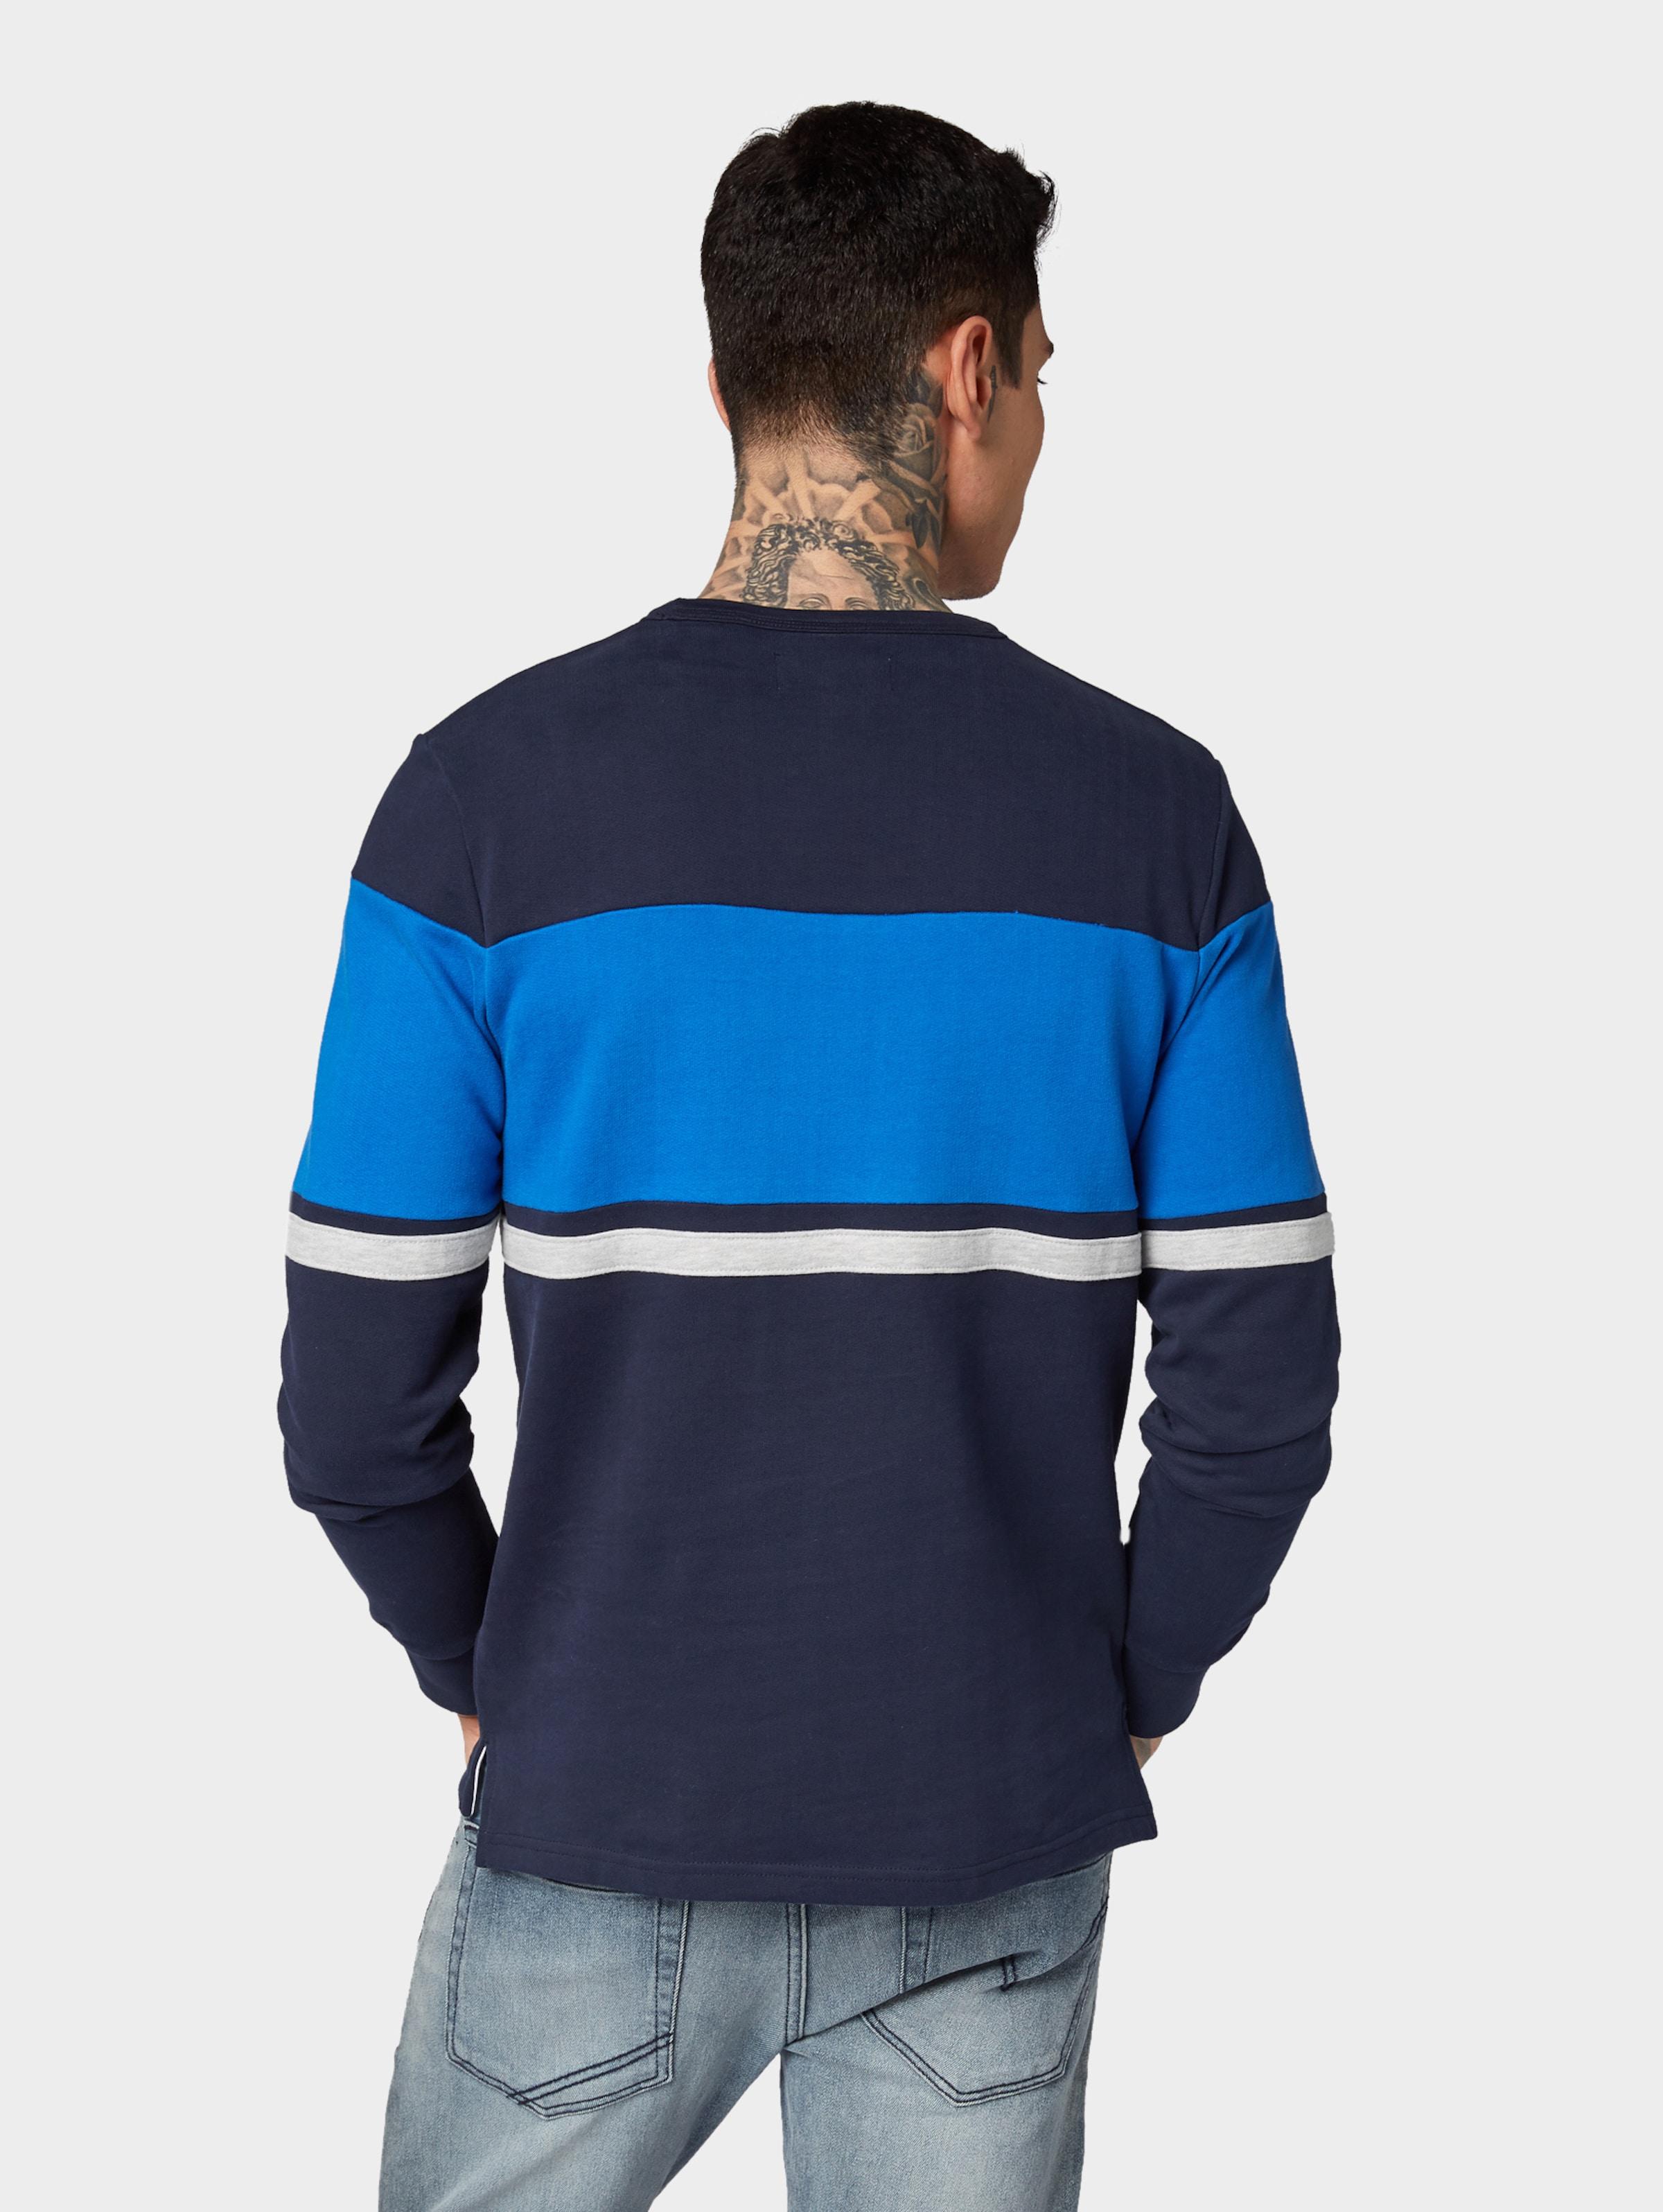 Tailor In Denim NavyRoyalblau Tom Sweatshirt hQtrsBCdxo